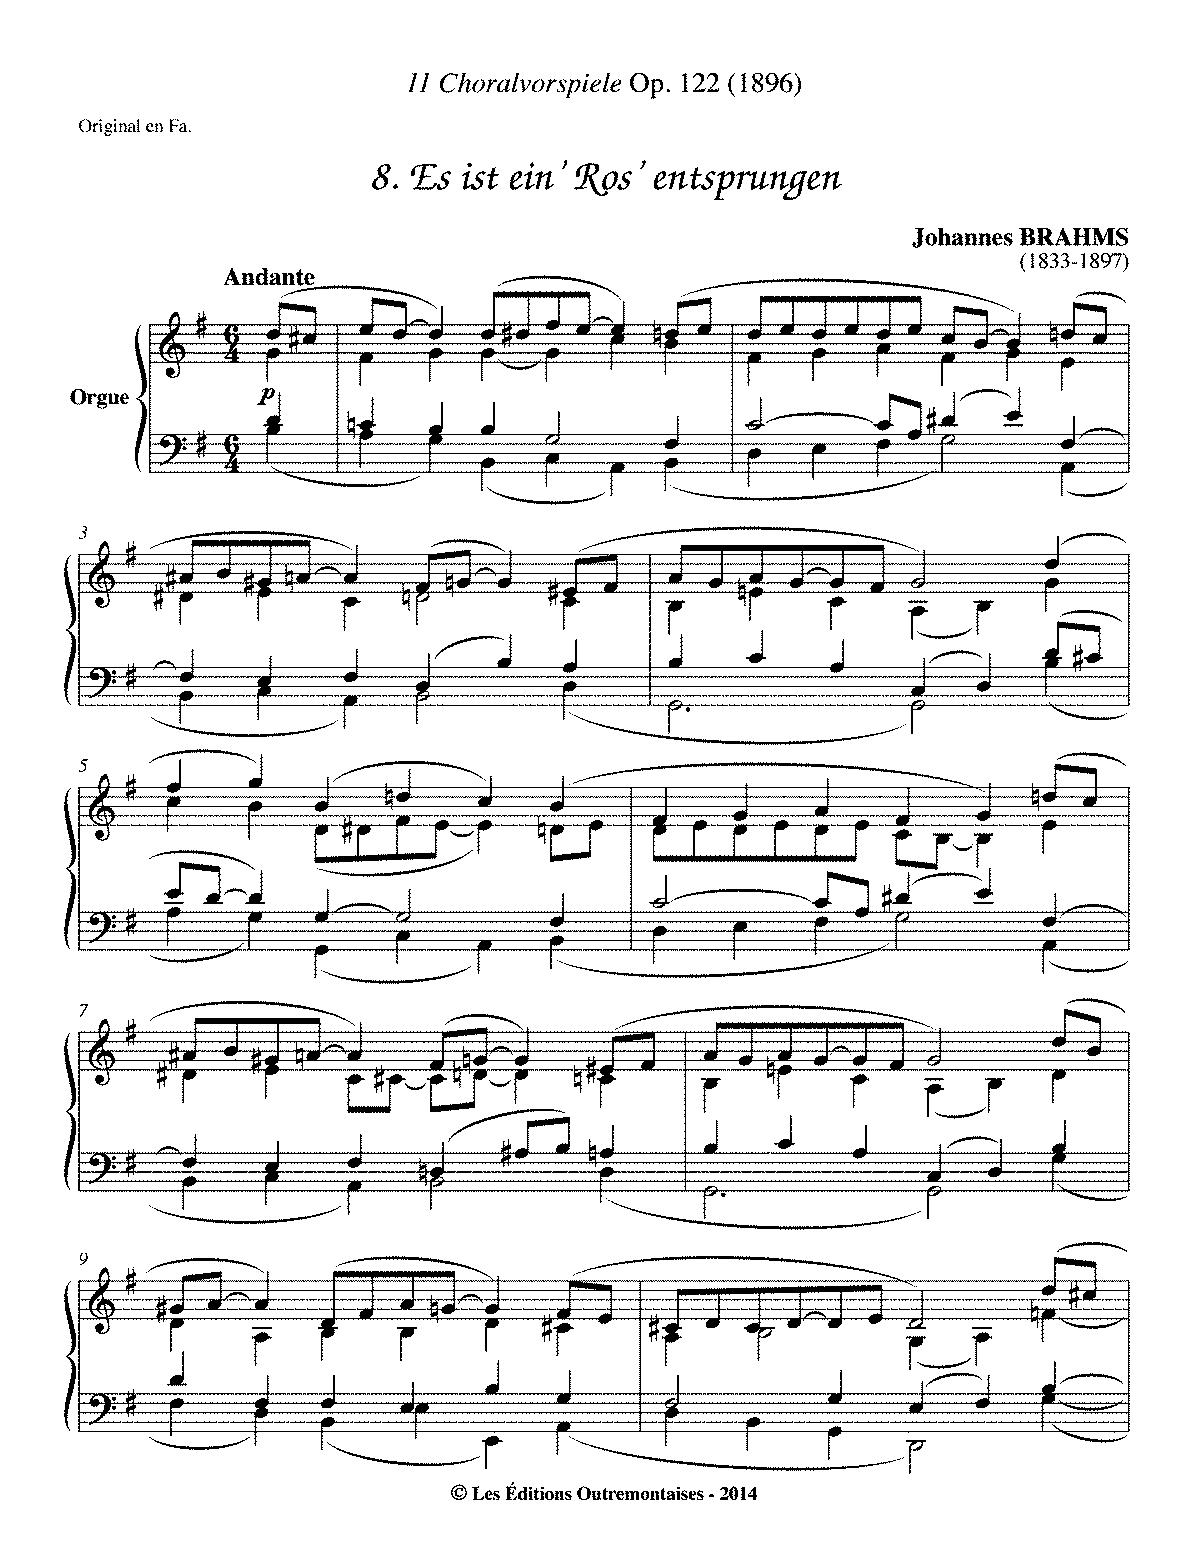 Pubg Theme Song Piano Mp3 Download - Ogmetro com